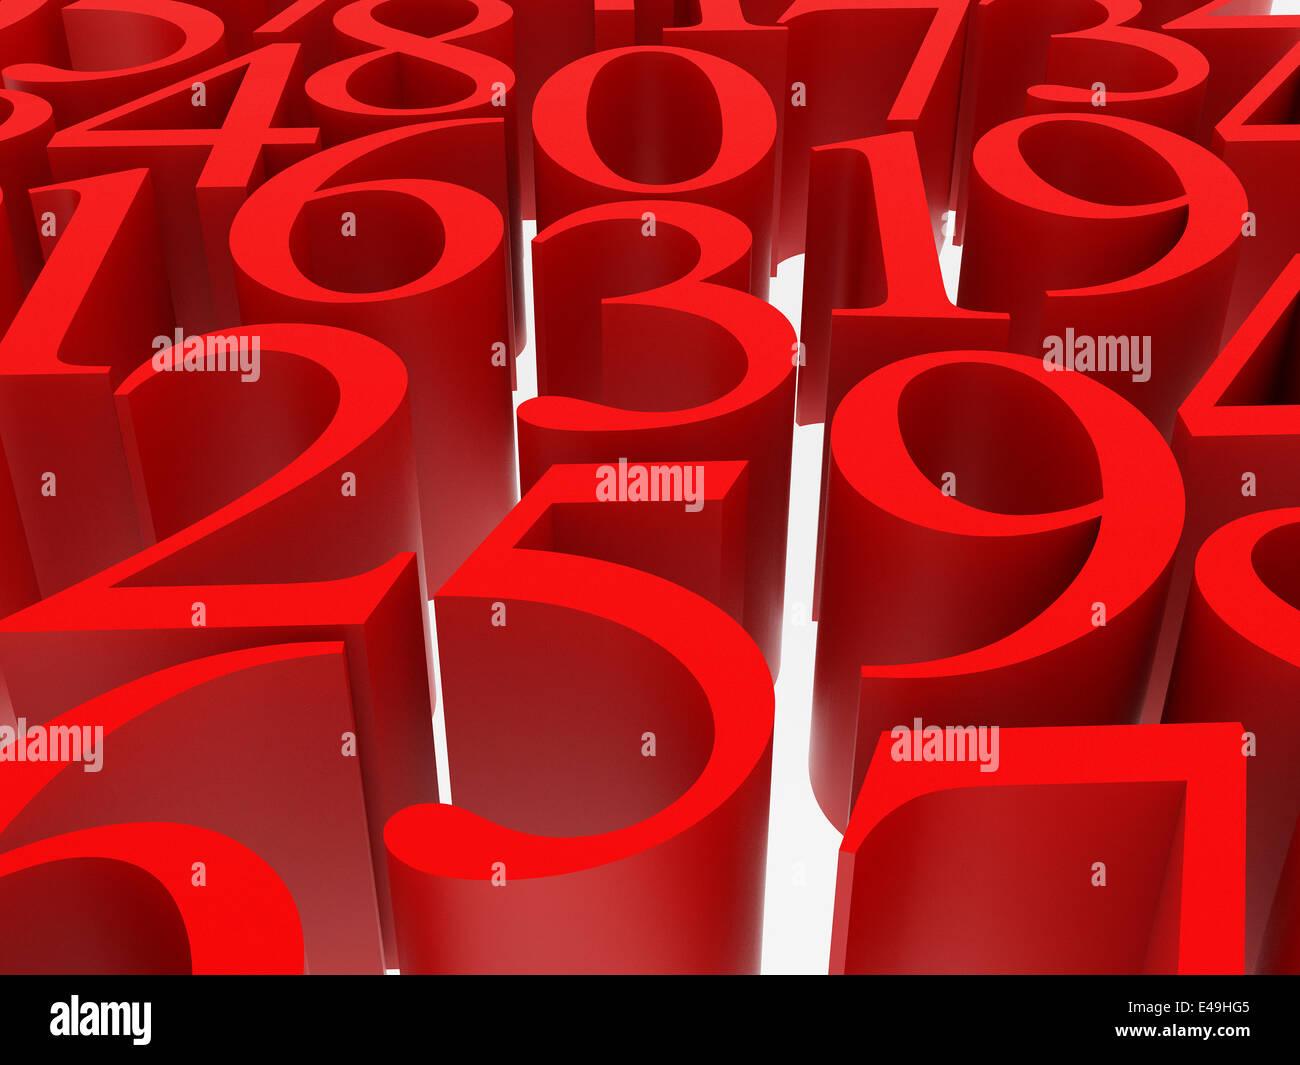 mathematics symbol - Stock Image